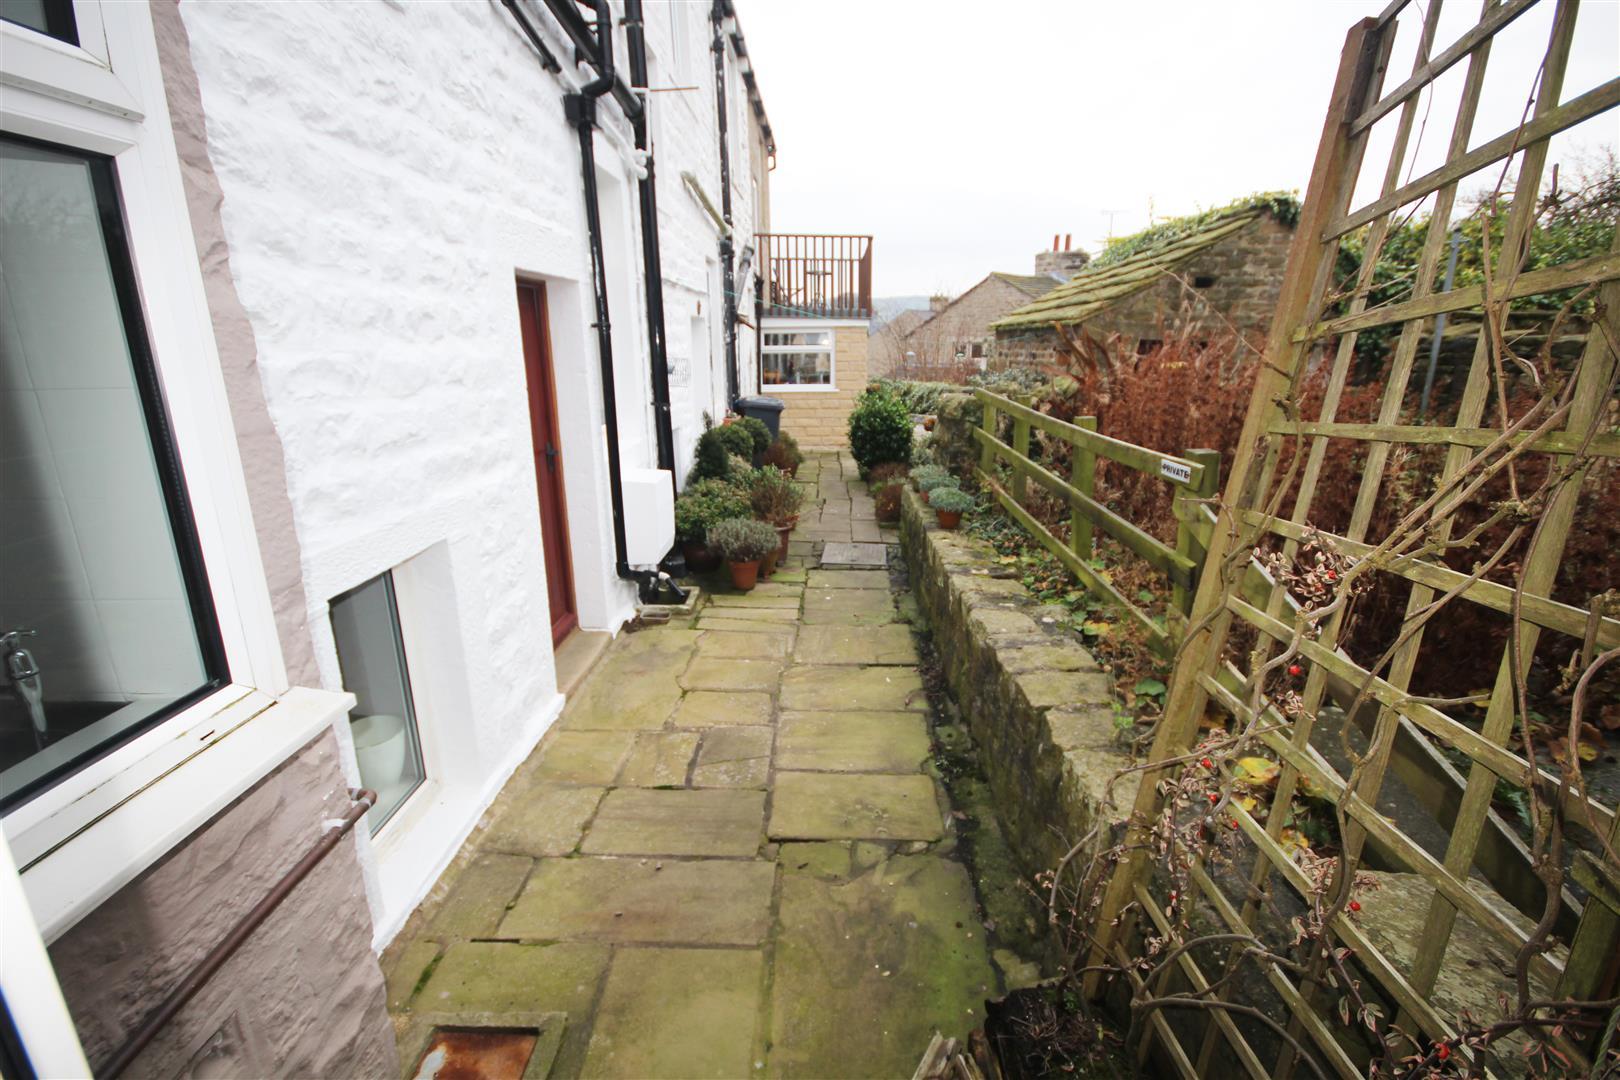 1 bedroom cottage To Let in Salterforth - 2016-12-19 13.43.46.jpg